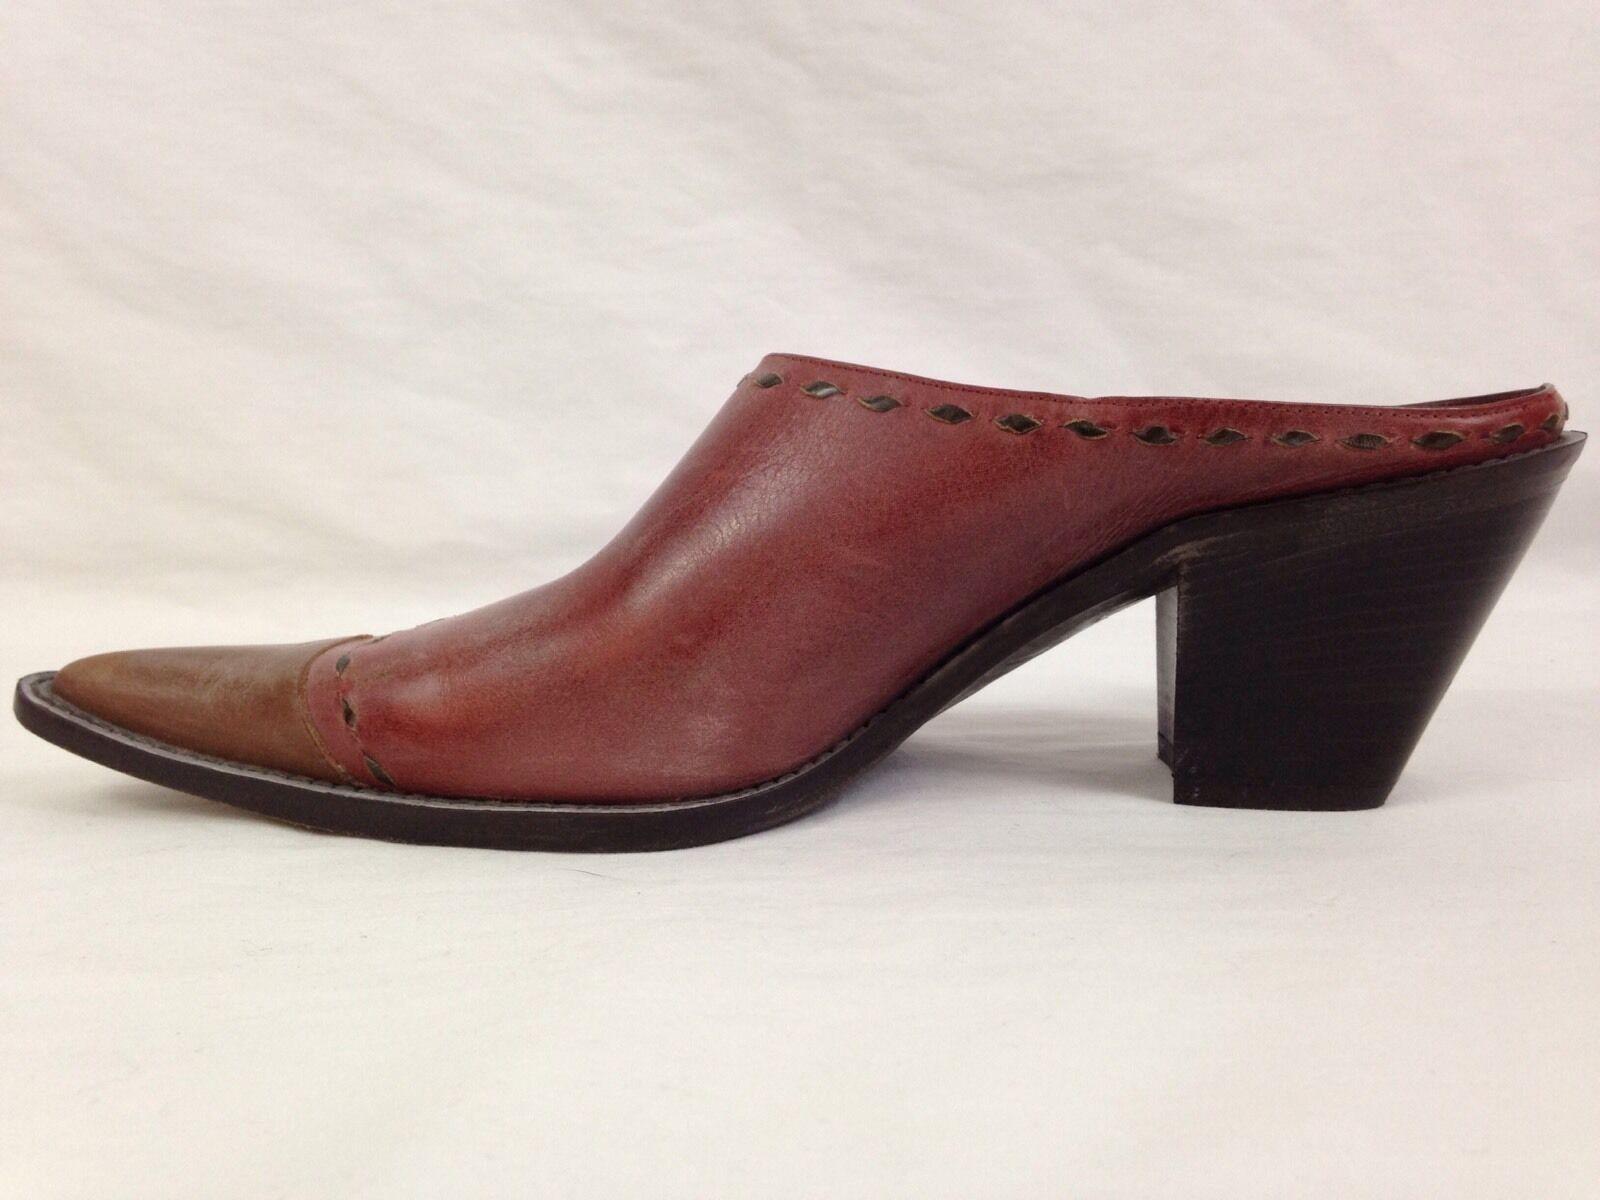 Donald Pliner Western Couture Damenschuhe Schuhes Größe 8.5 N N 8.5 Slip Ons Mules Clogs  3ccf9f